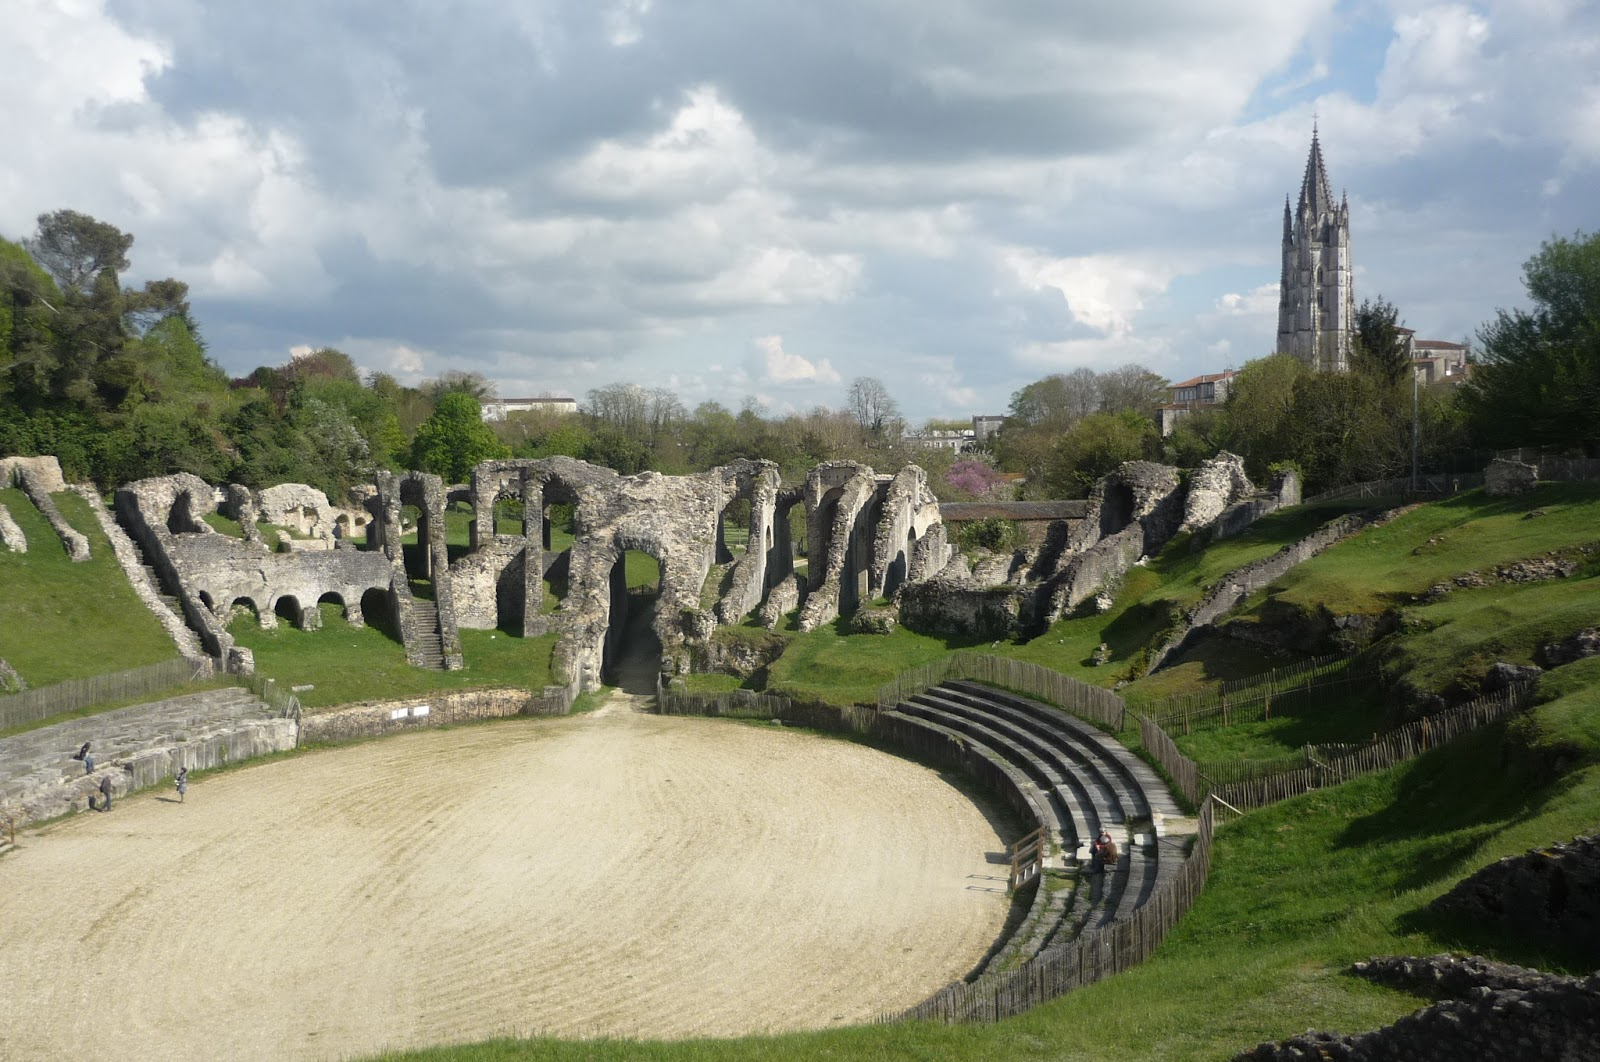 Saintes France  city photo : ... Gite with heated pool Charente Maritime France: Roman City of Saintes